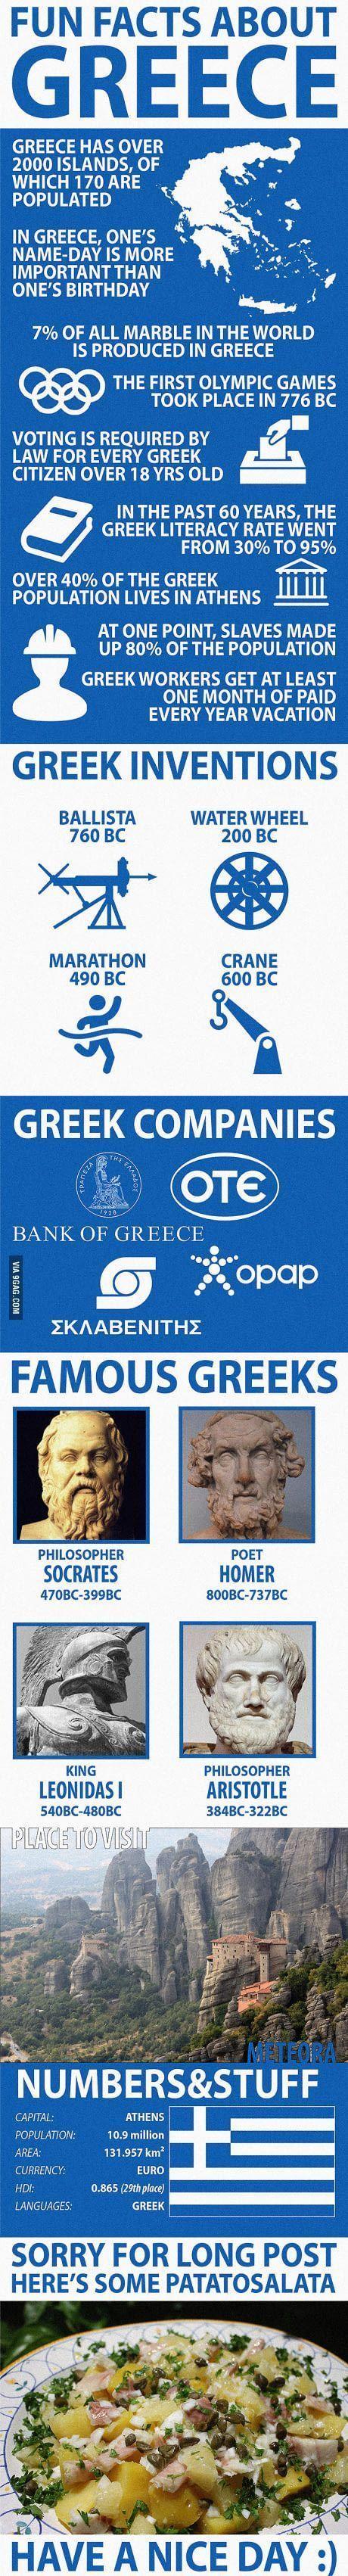 Wissenswertes Uber Griechenland Urlaub Griechenland Griechenland Uber Urlaub Wissen Fun Facts Travel Facts Country Facts